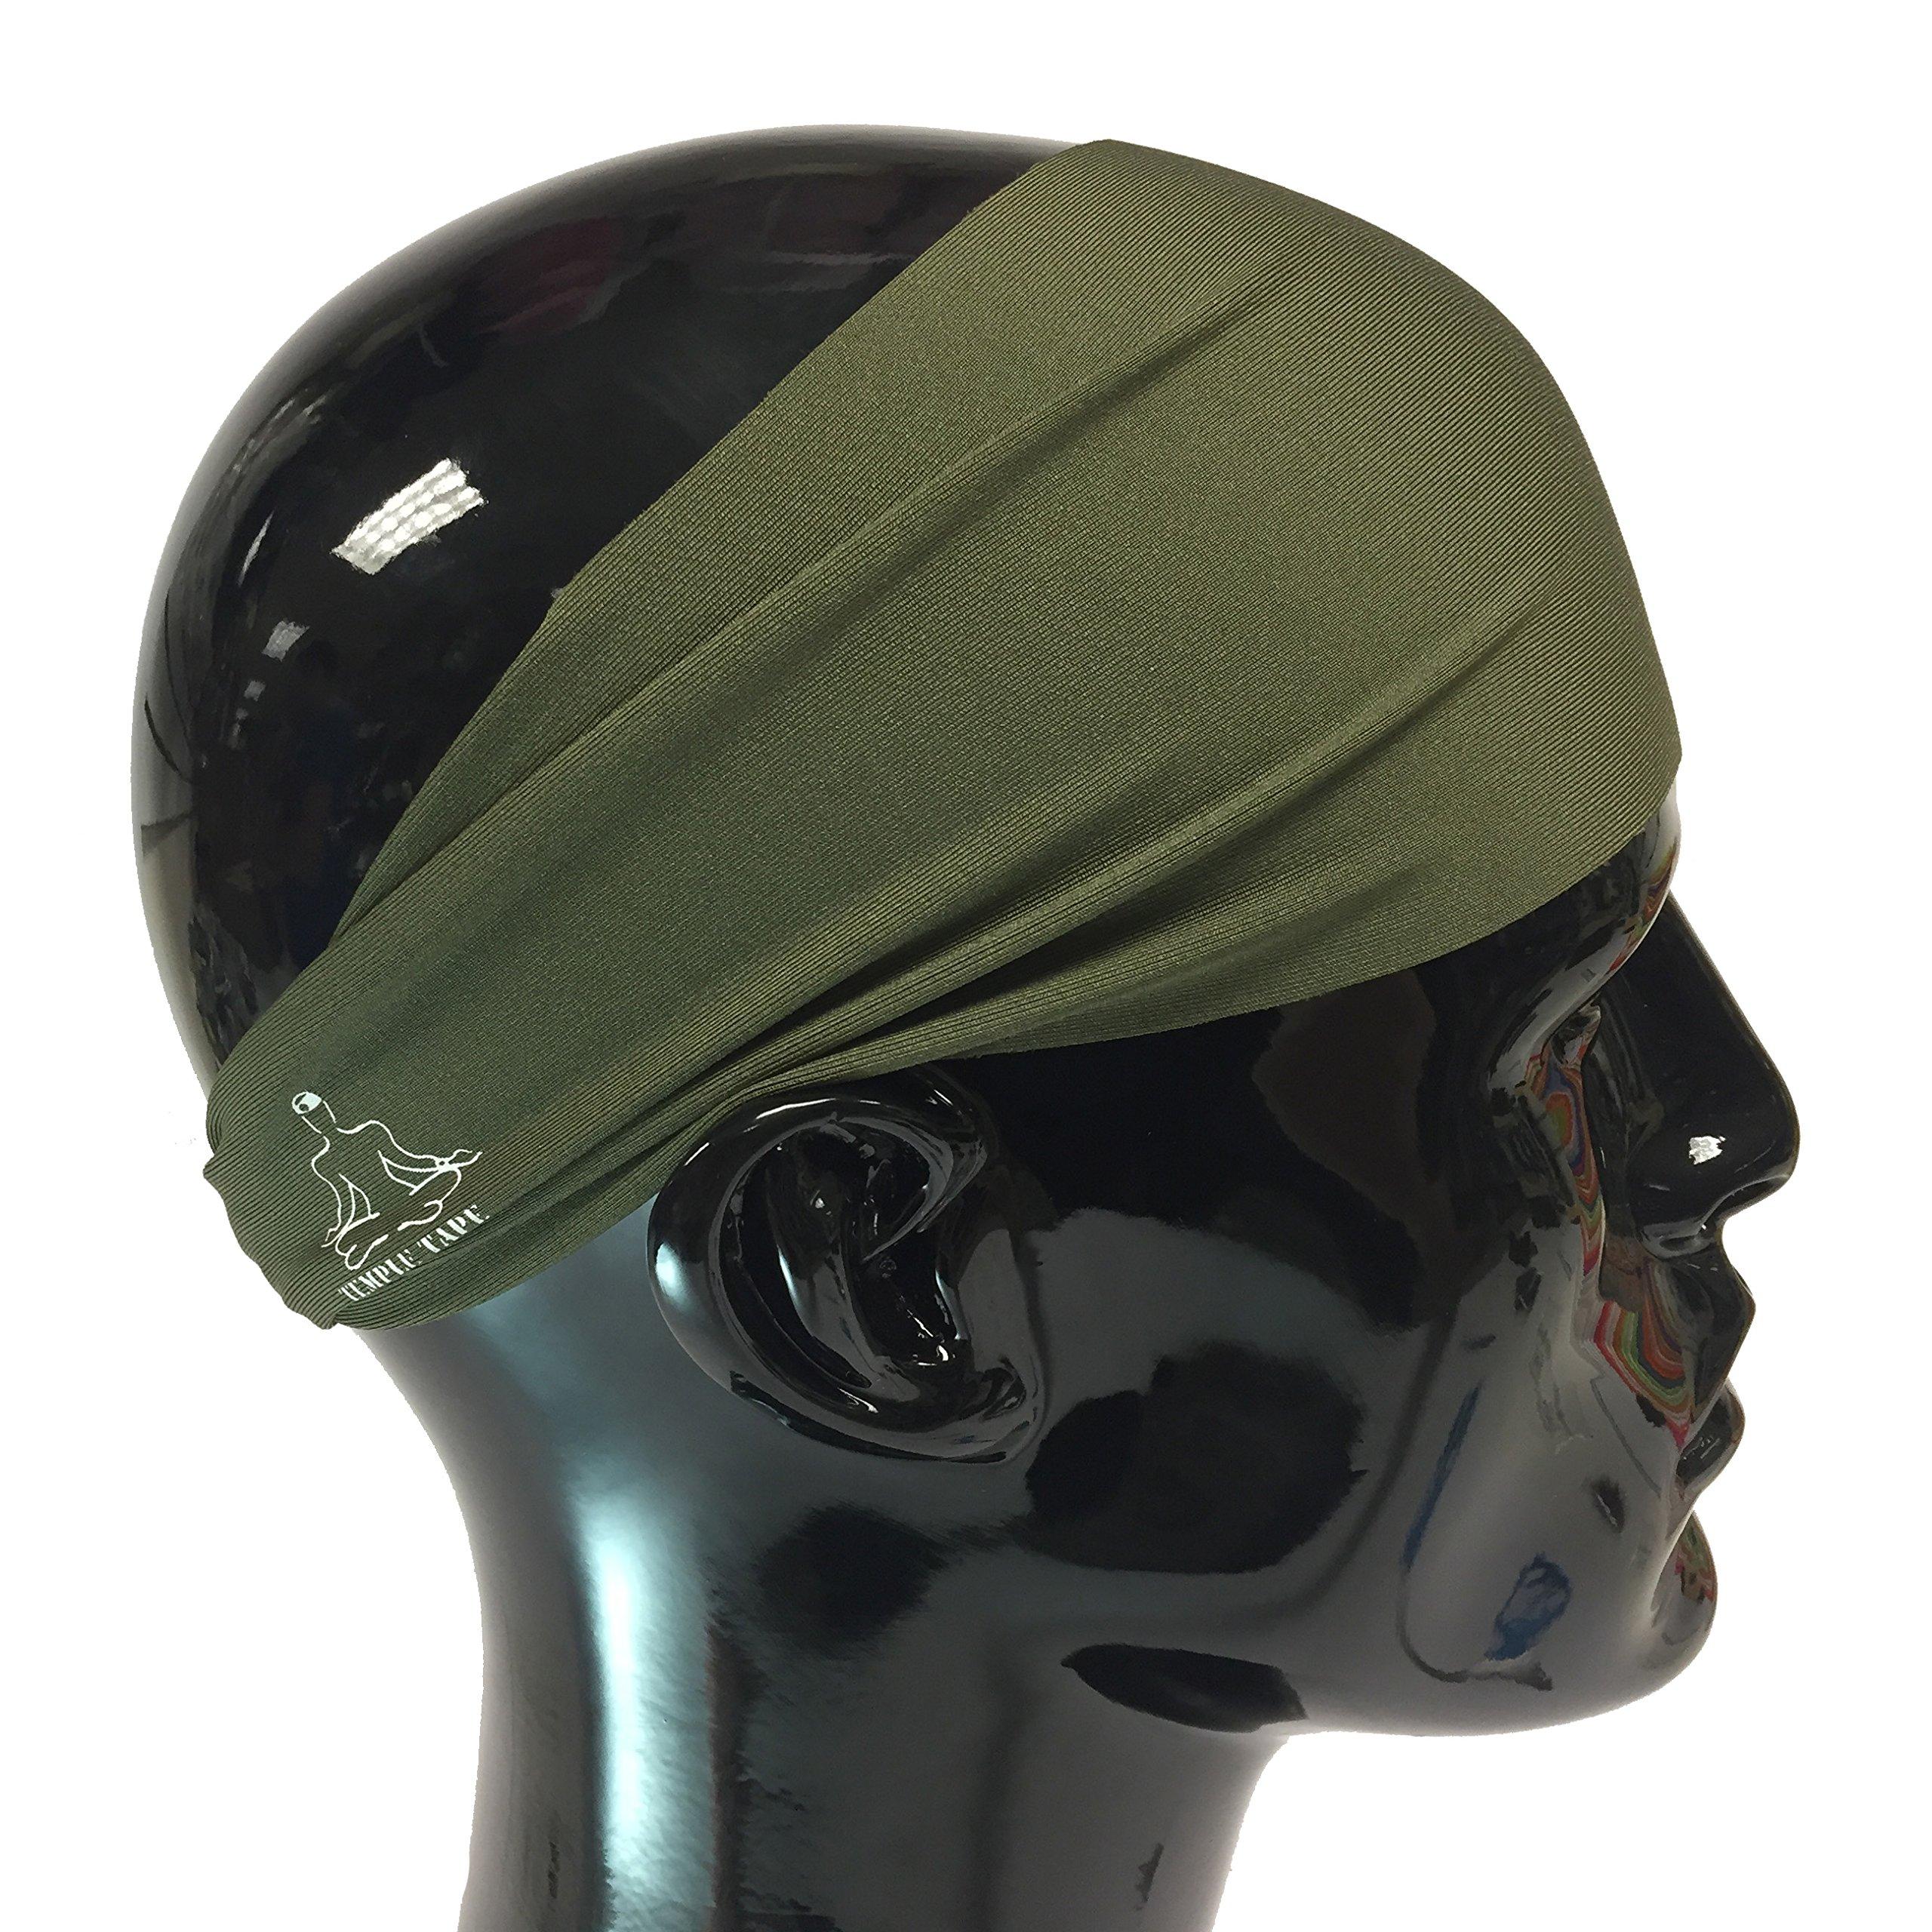 Temple Tape Headbands for Men and Women - Mens Sweatband & Sports Headband Moisture Wicking Workout Sweatbands for Running, Cross Training, Yoga and Bike Helmet Friendly - OD Green